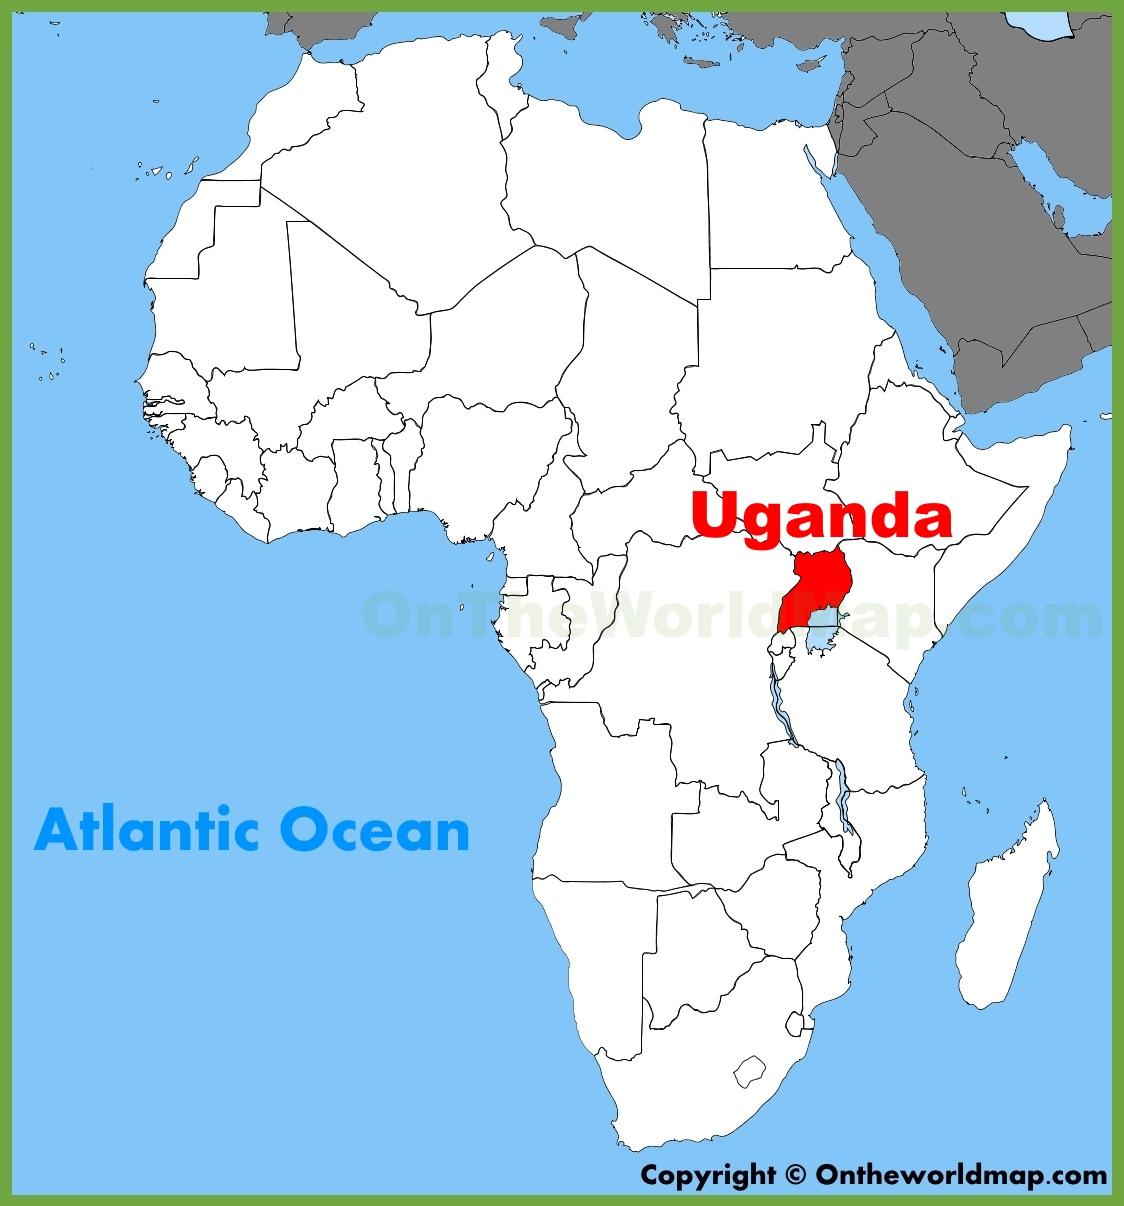 Map Of Uganda Africa Uganda location on the Africa map